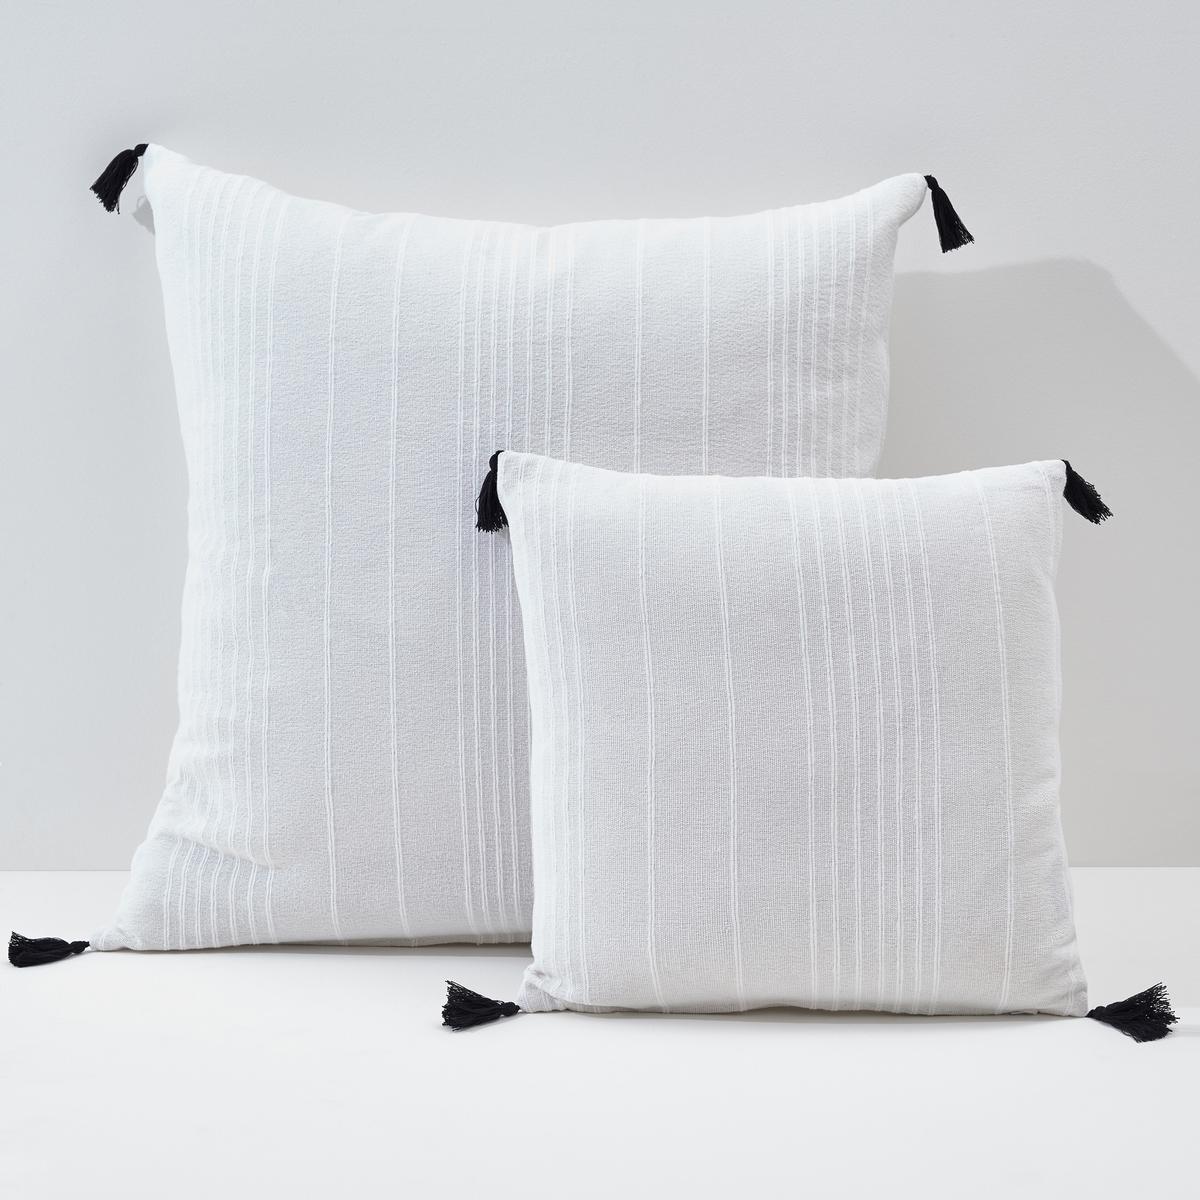 Чехол для подушки или наволочка однотонного цвета с помпонами, RIAD